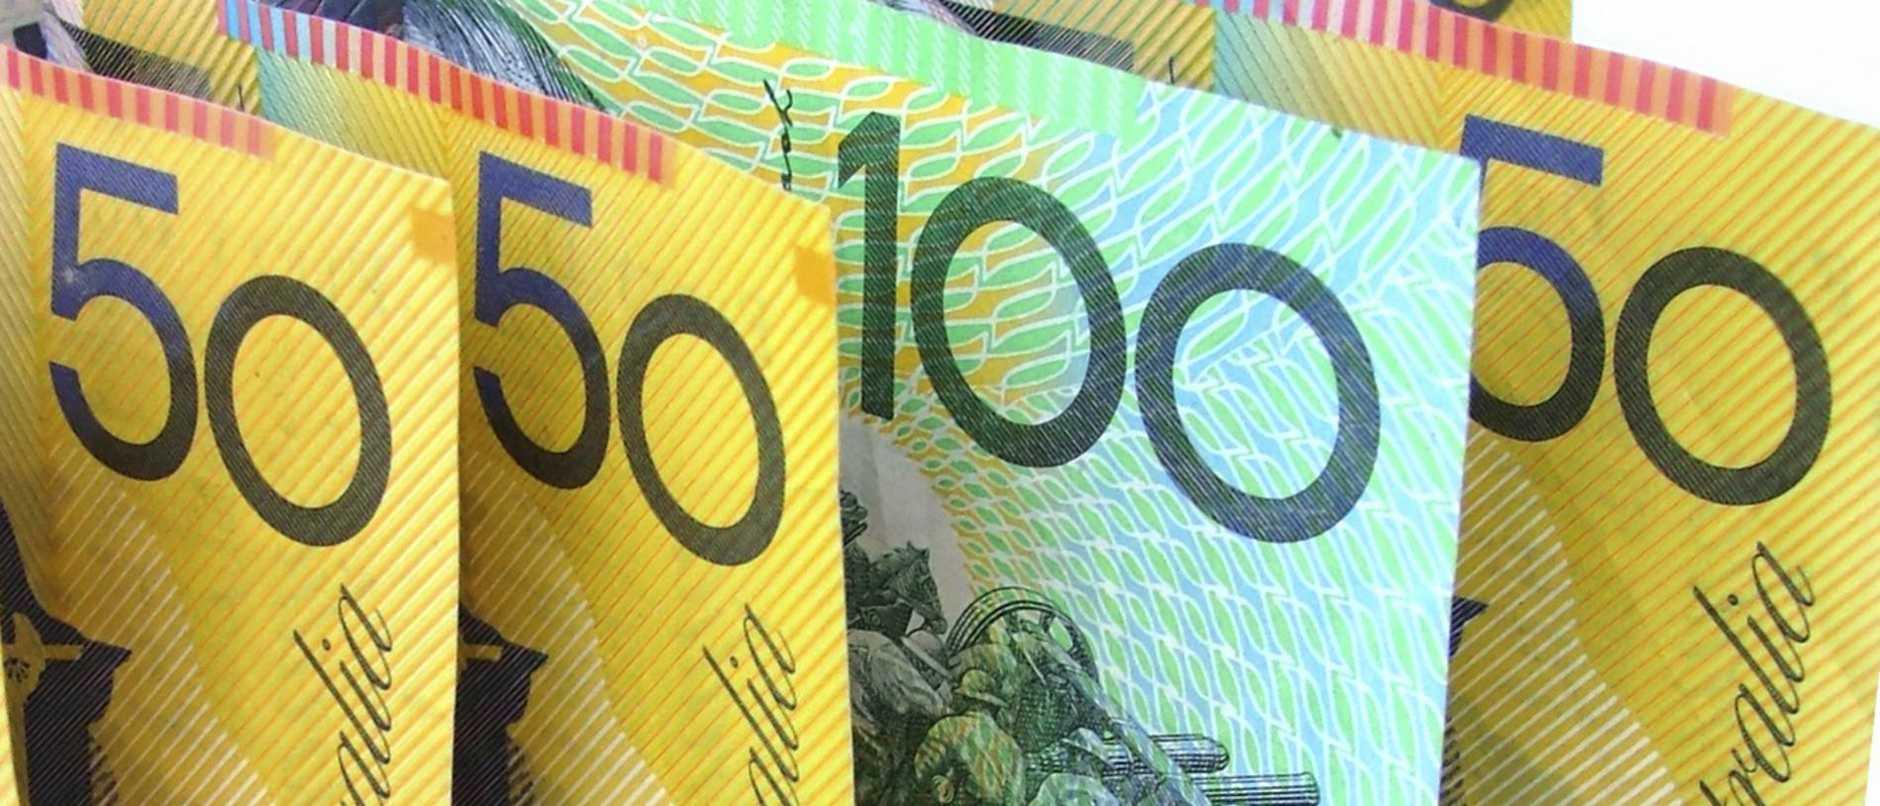 Australian money / cash / notes